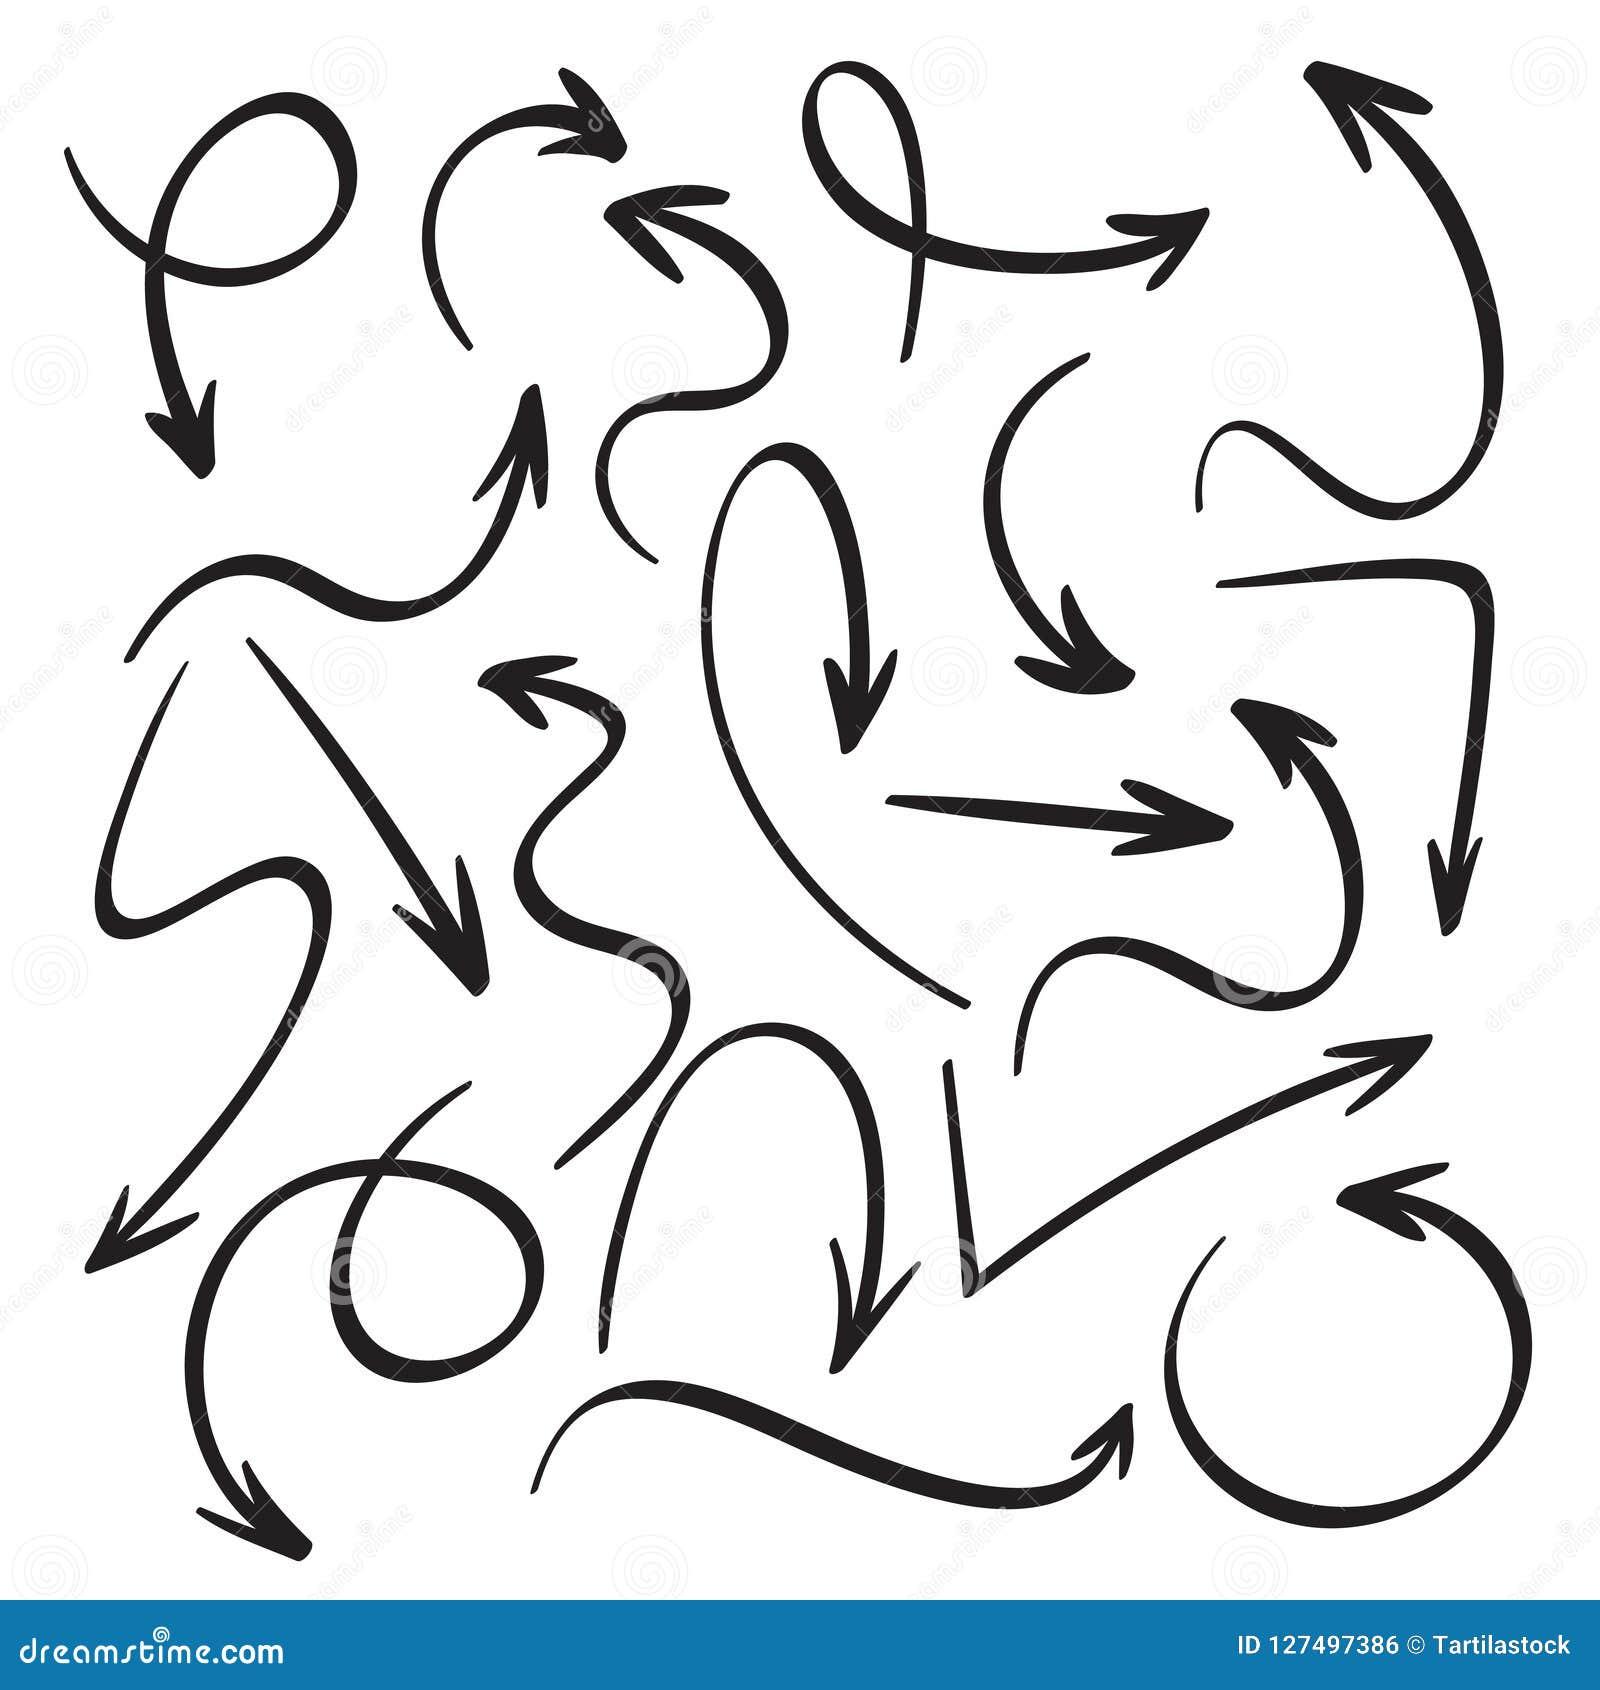 Cartoon black arrows. Hand drawn arrow sketch. Swirl, return back and direction pointer vector icons set